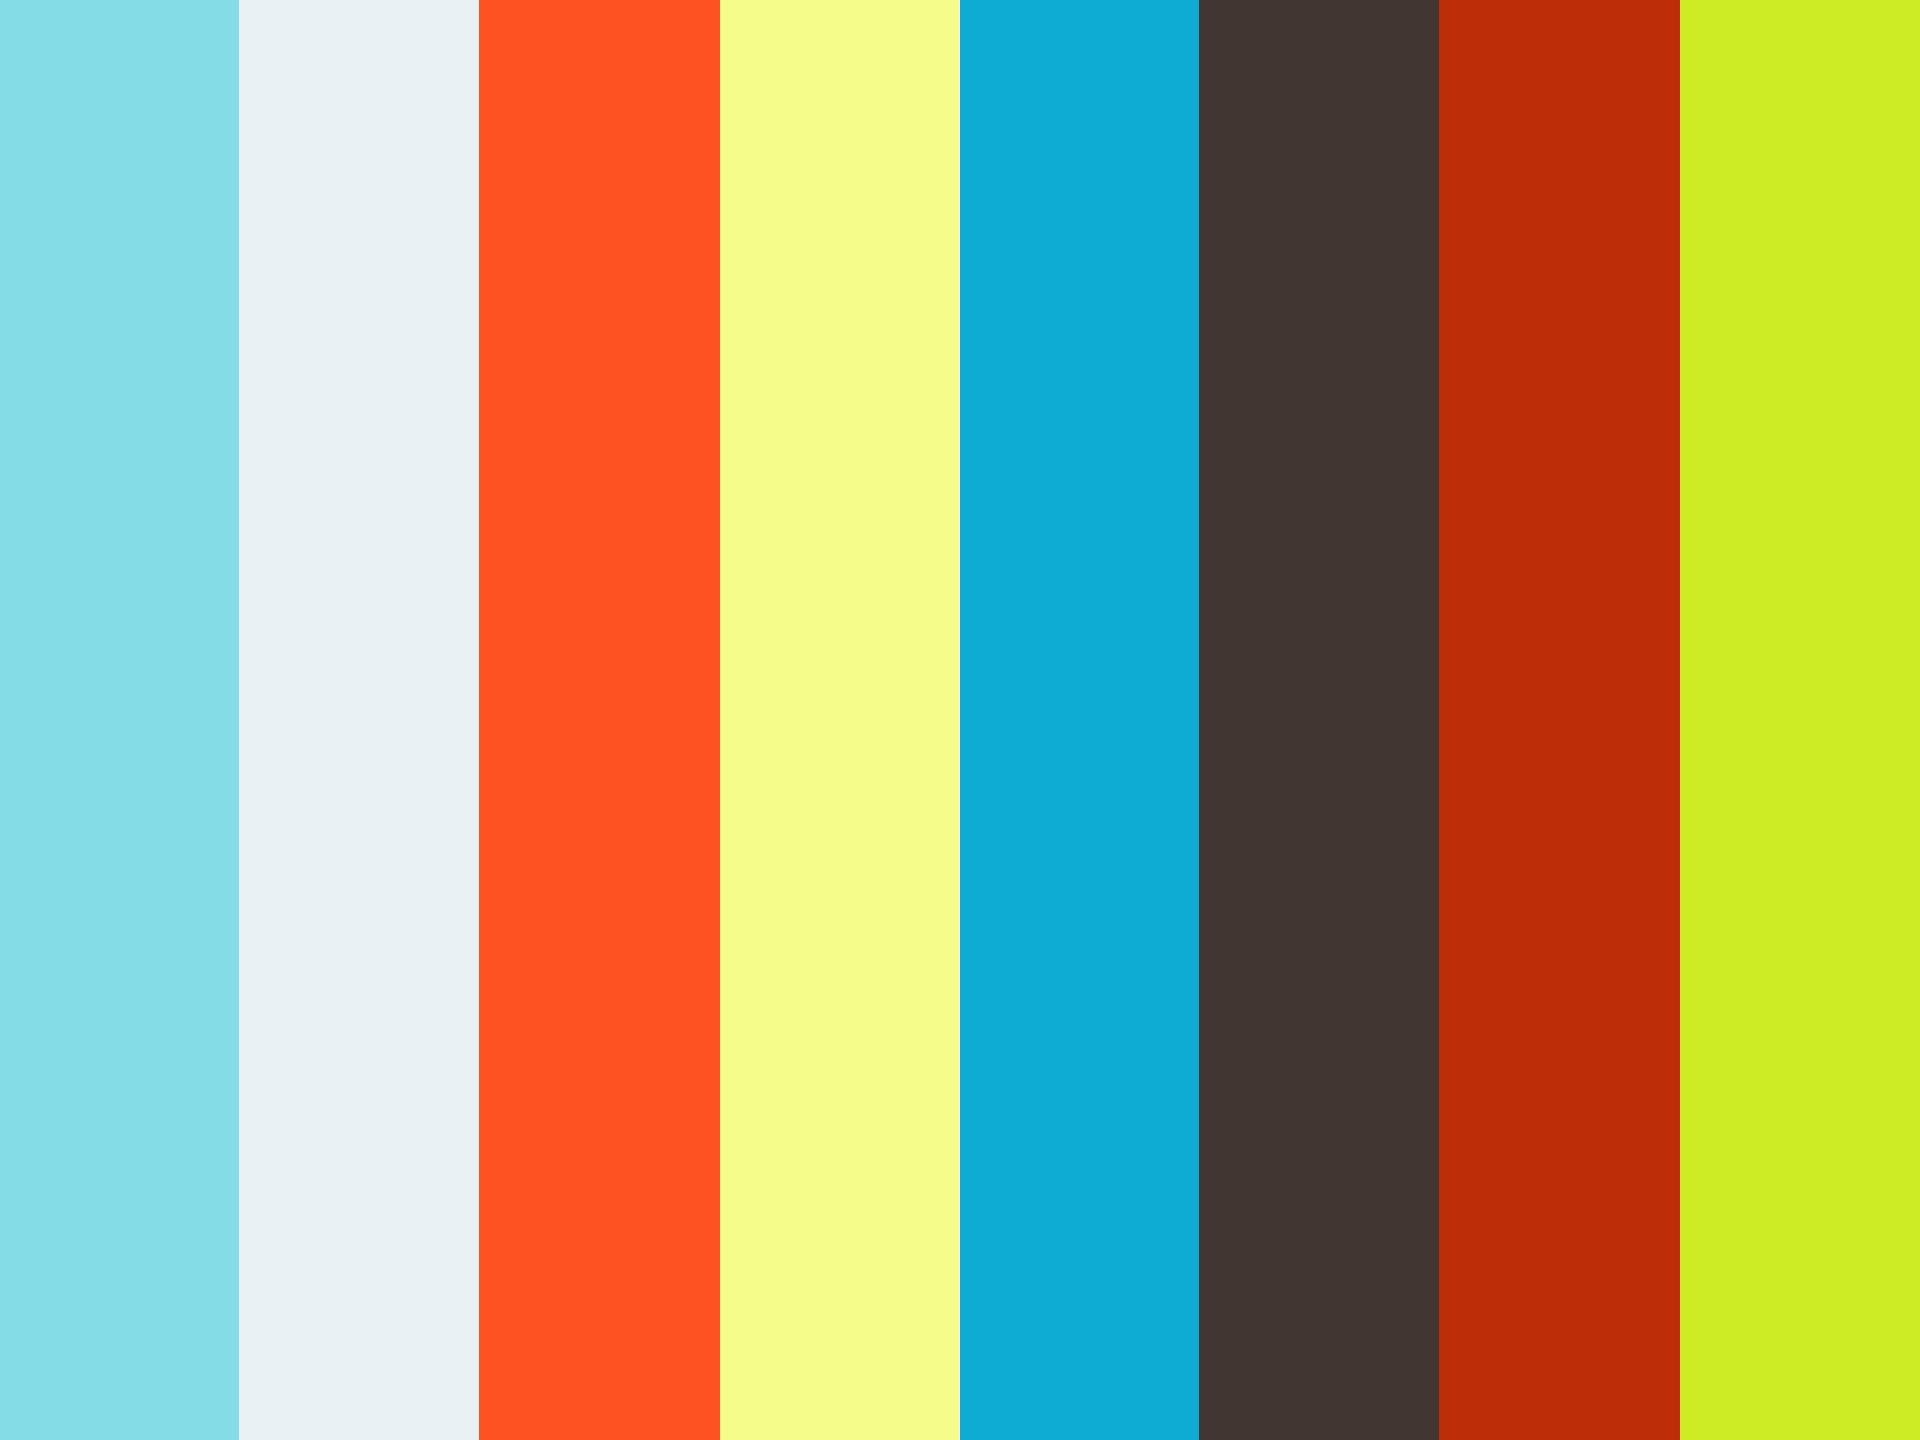 pulse wiring diagram [ 1280 x 720 Pixel ]